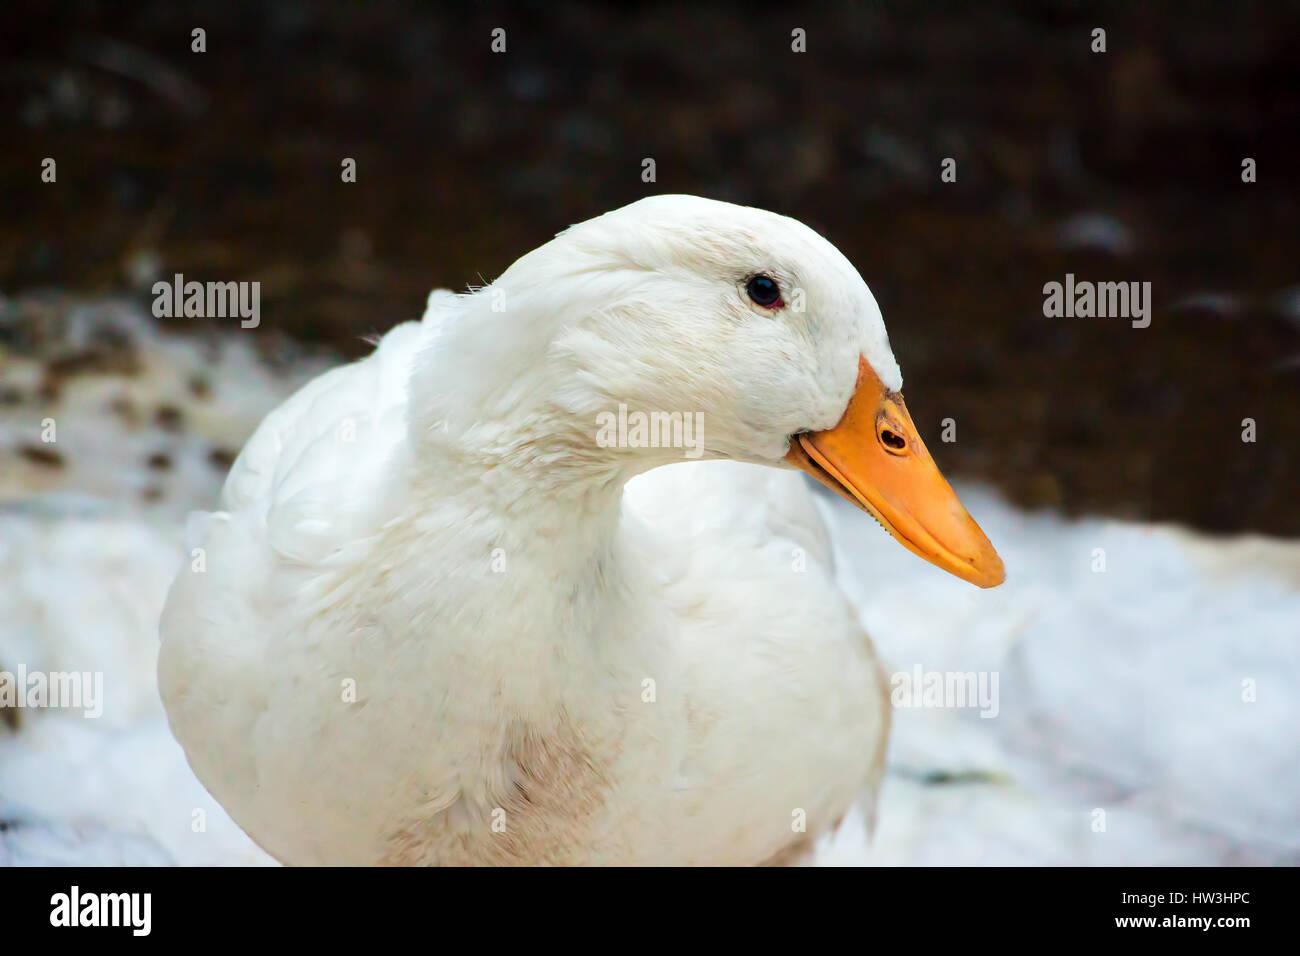 Real Pekin duck - Stock Image